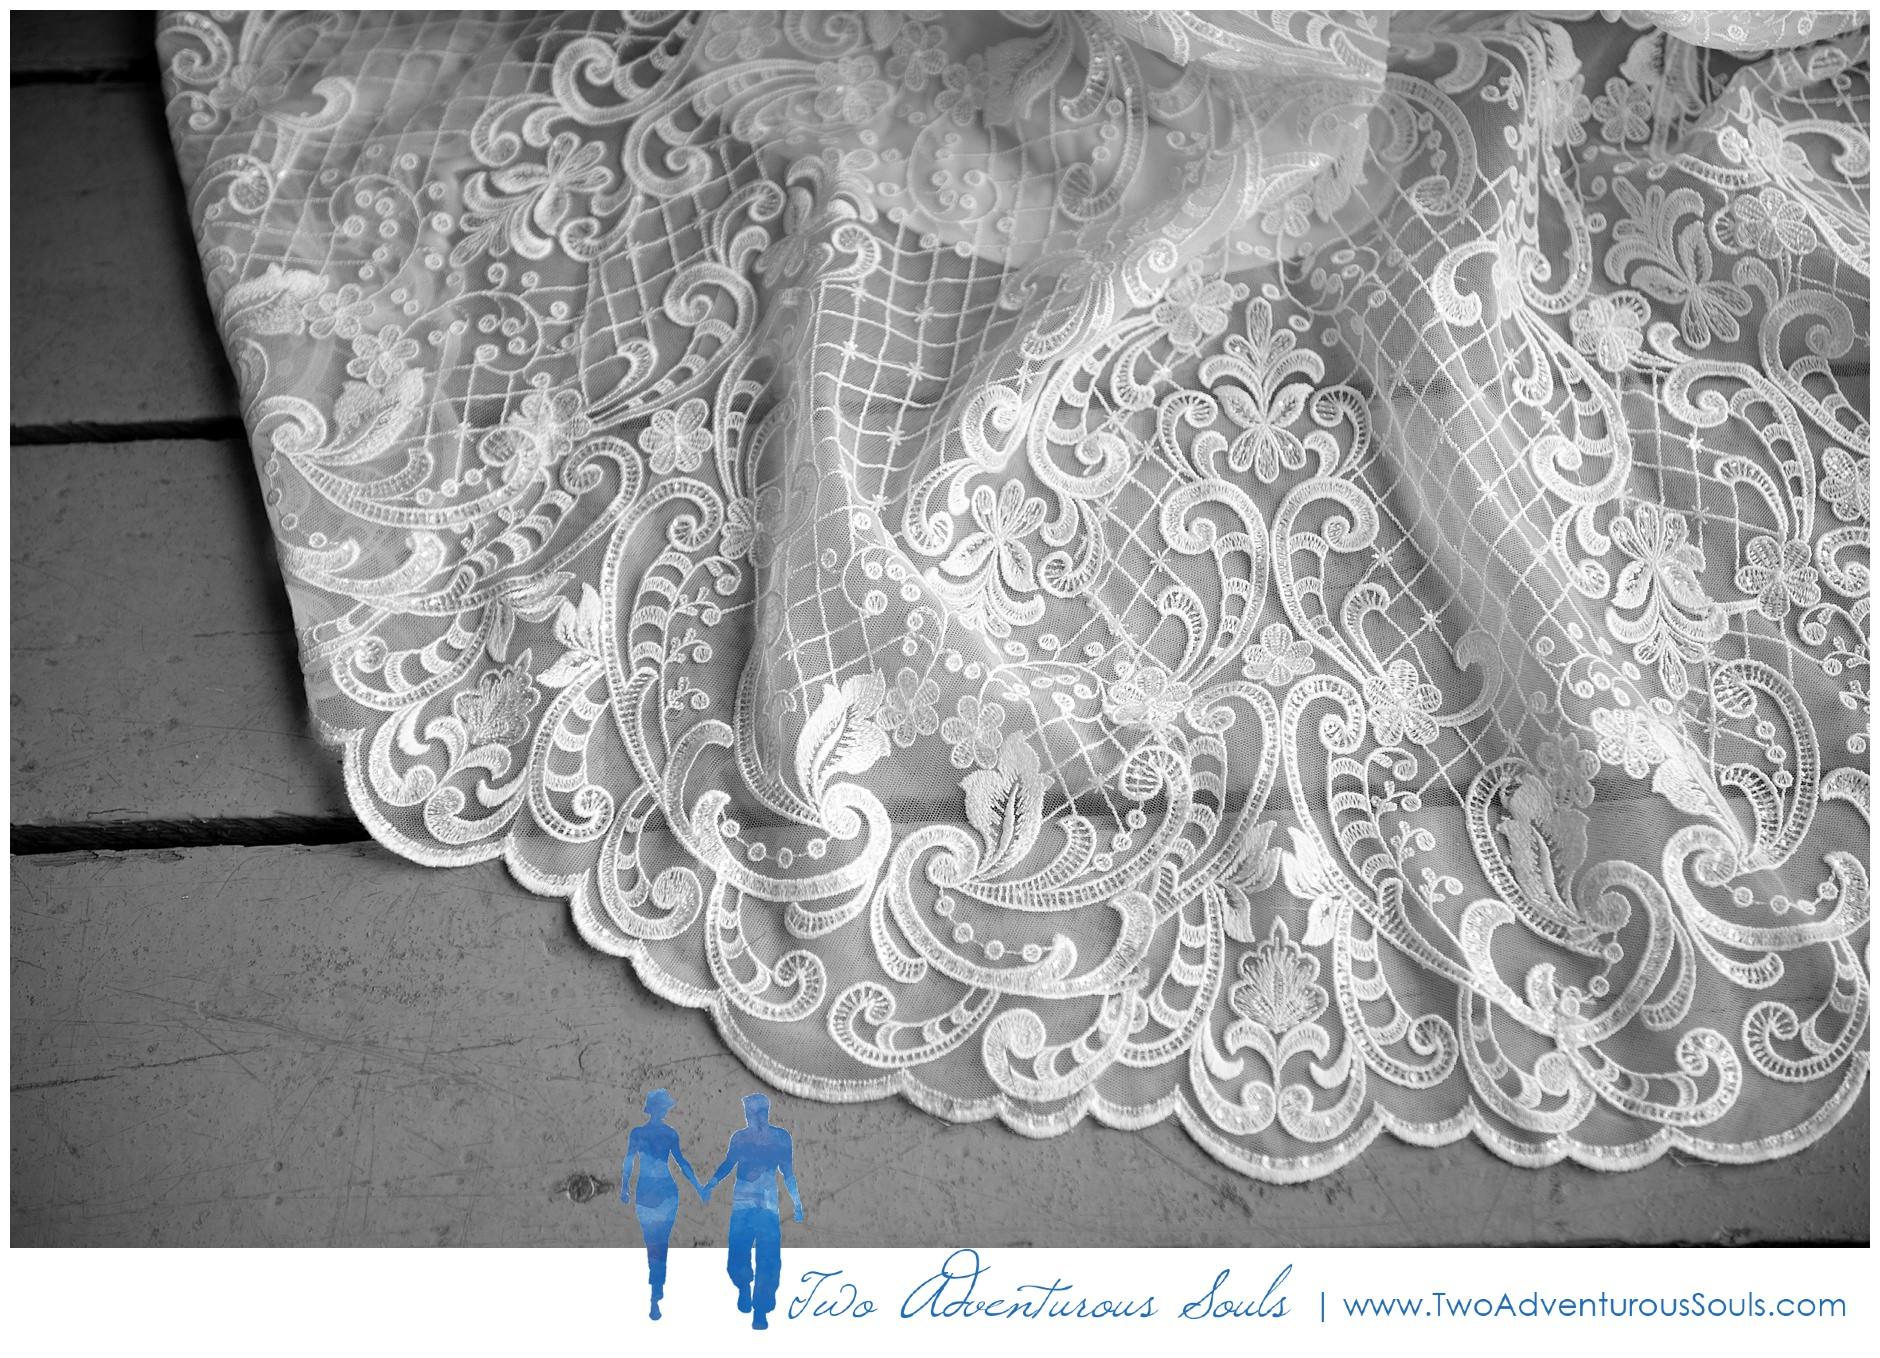 Chebeague Island Inn Wedding Photograpehrs, Maine Wedding Photographers, Two Adventurous Souls-082419_0018.jpg